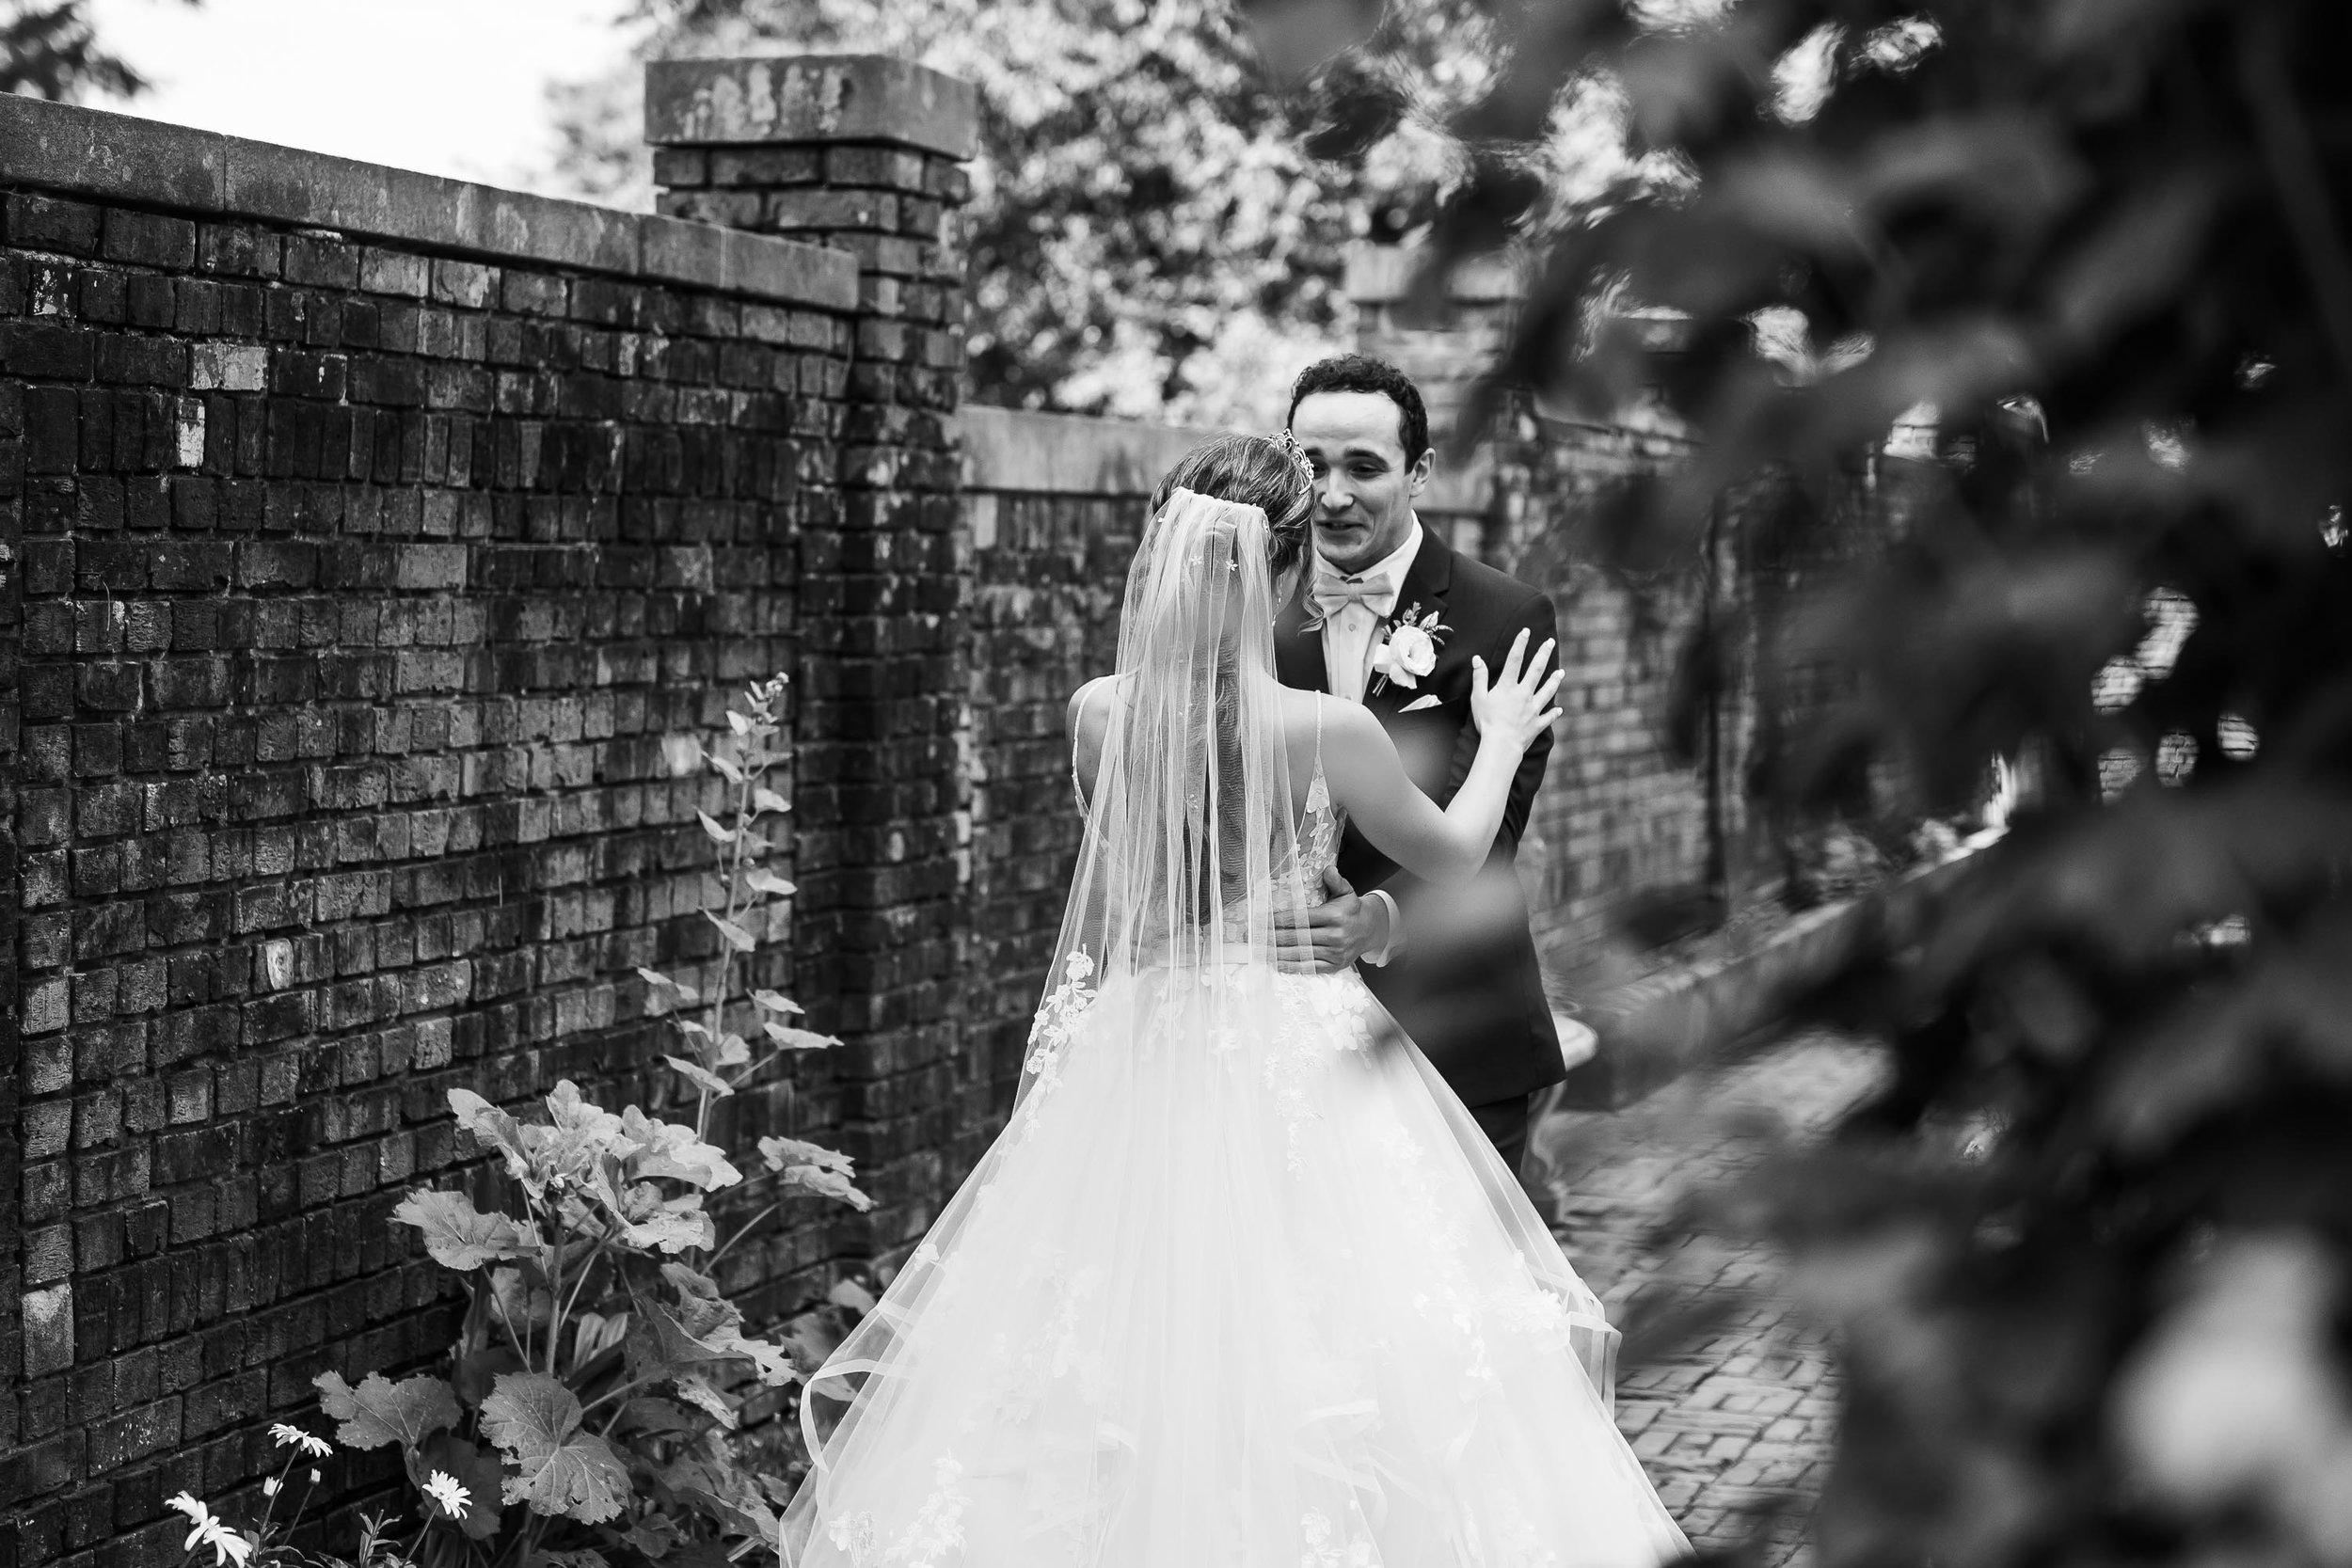 thornewood castle wedding 16.jpg